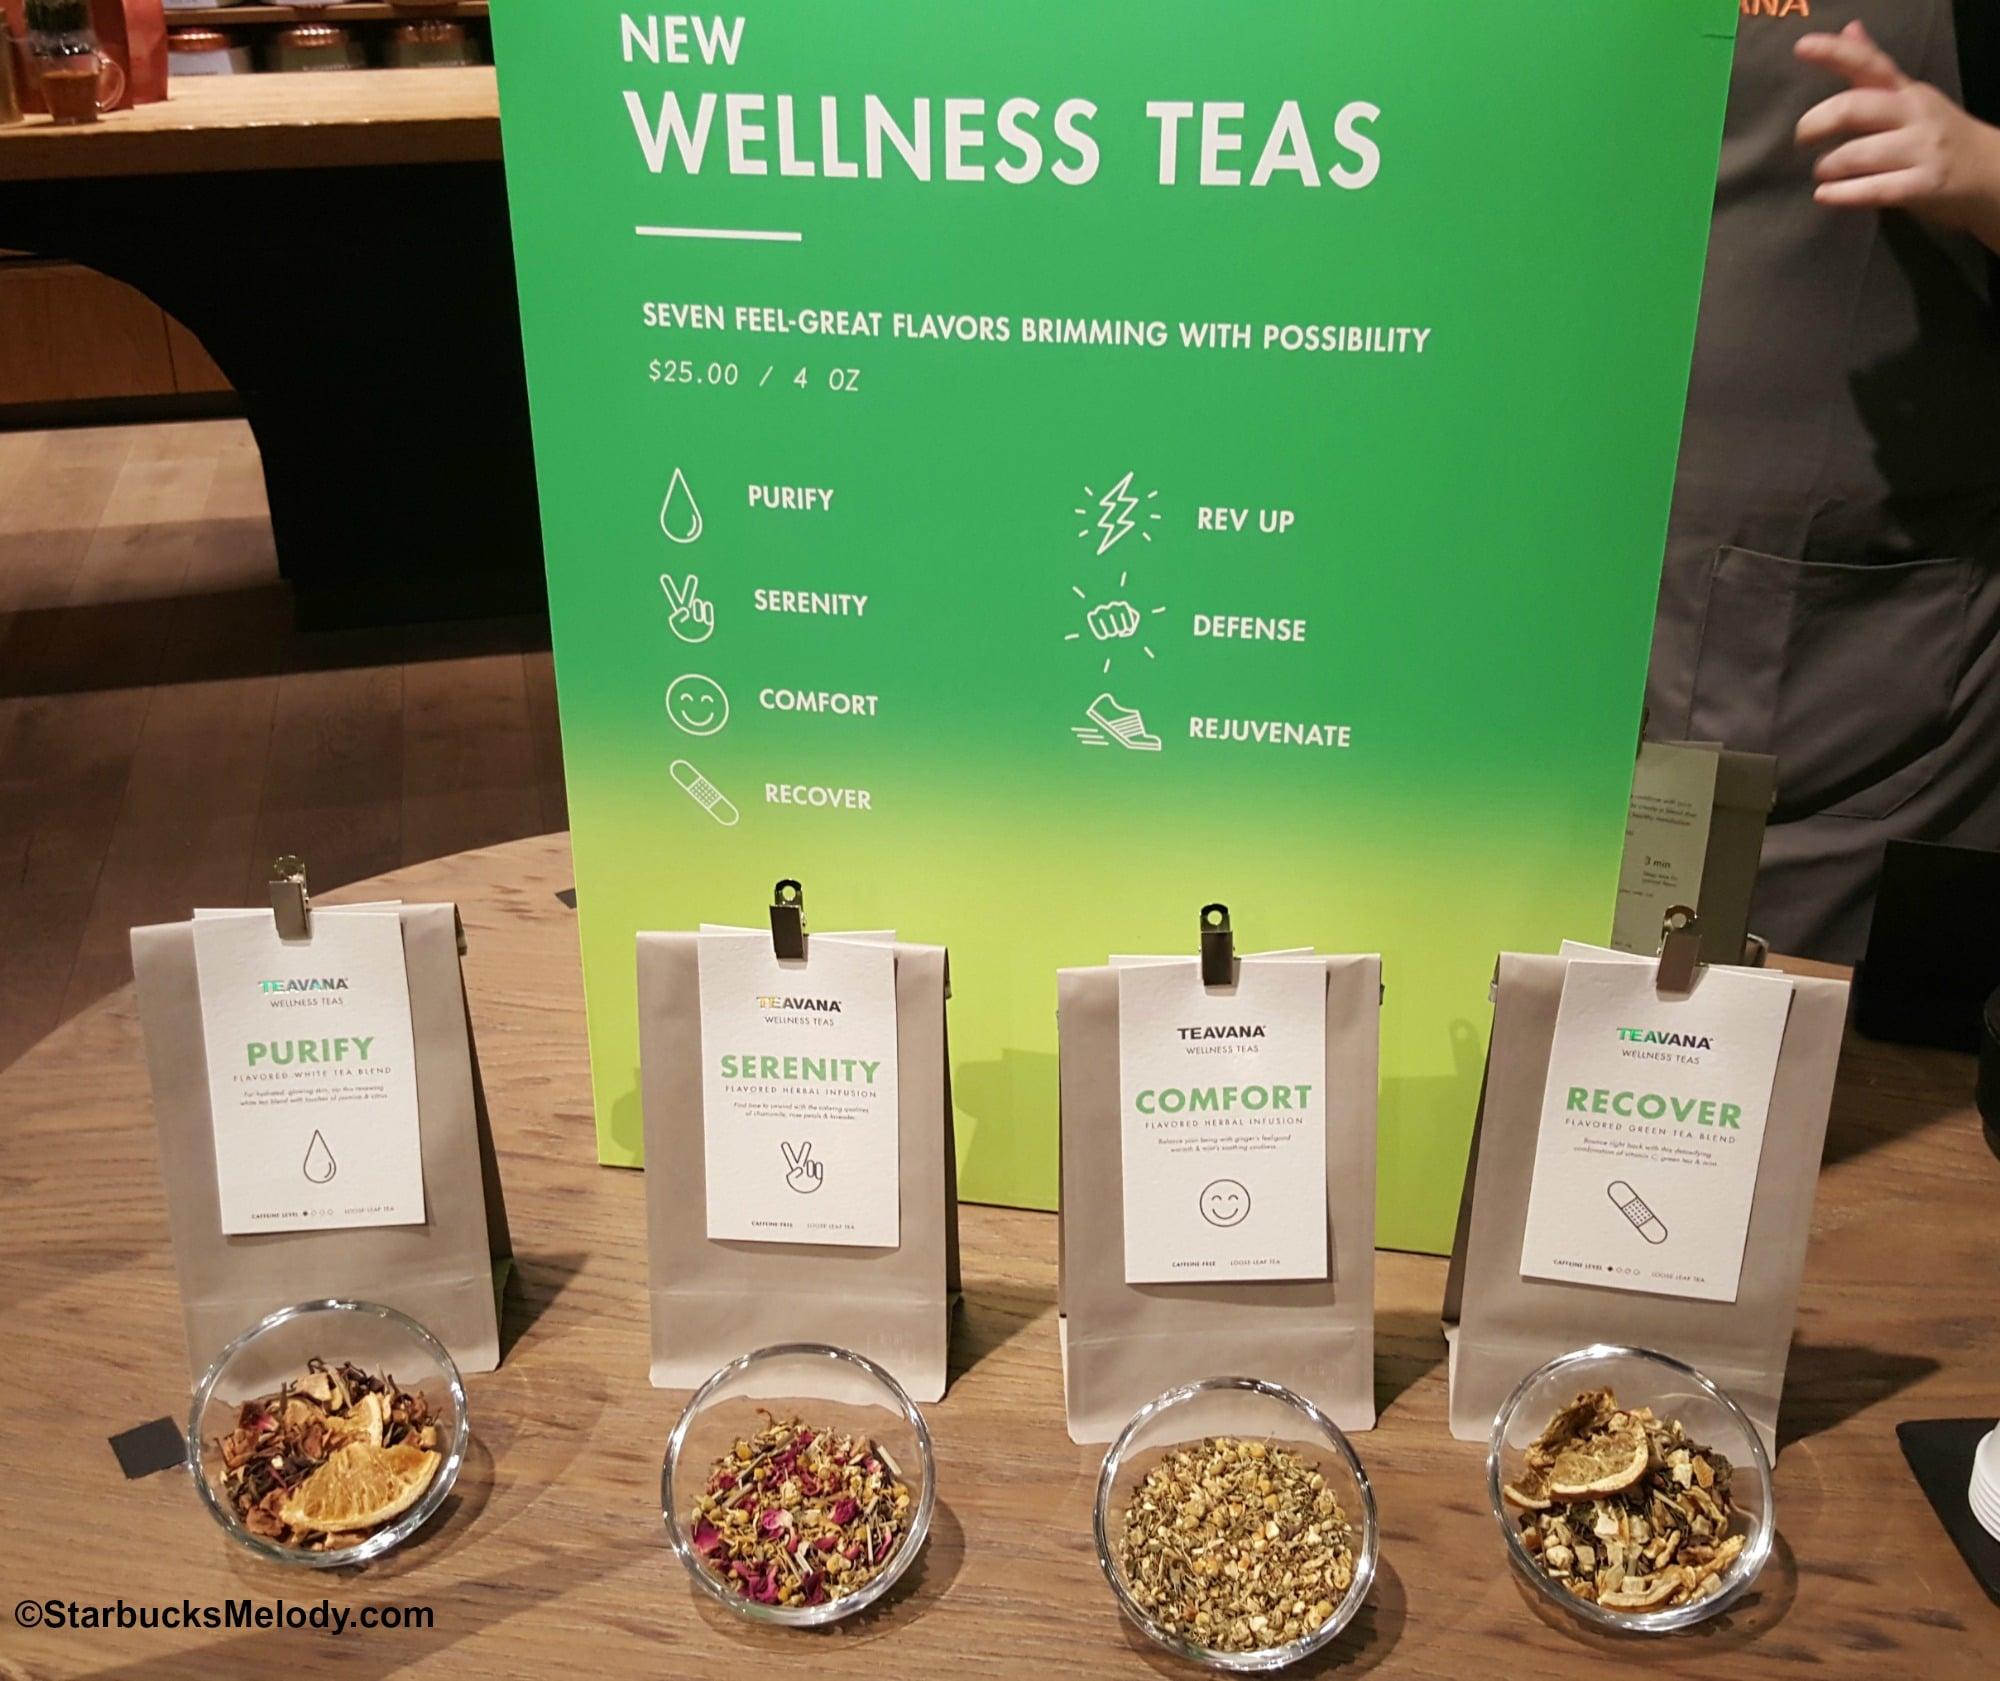 2 - 1 - 20160111_195103[1] wellness teas displays purify serenity comfort recover.jpg